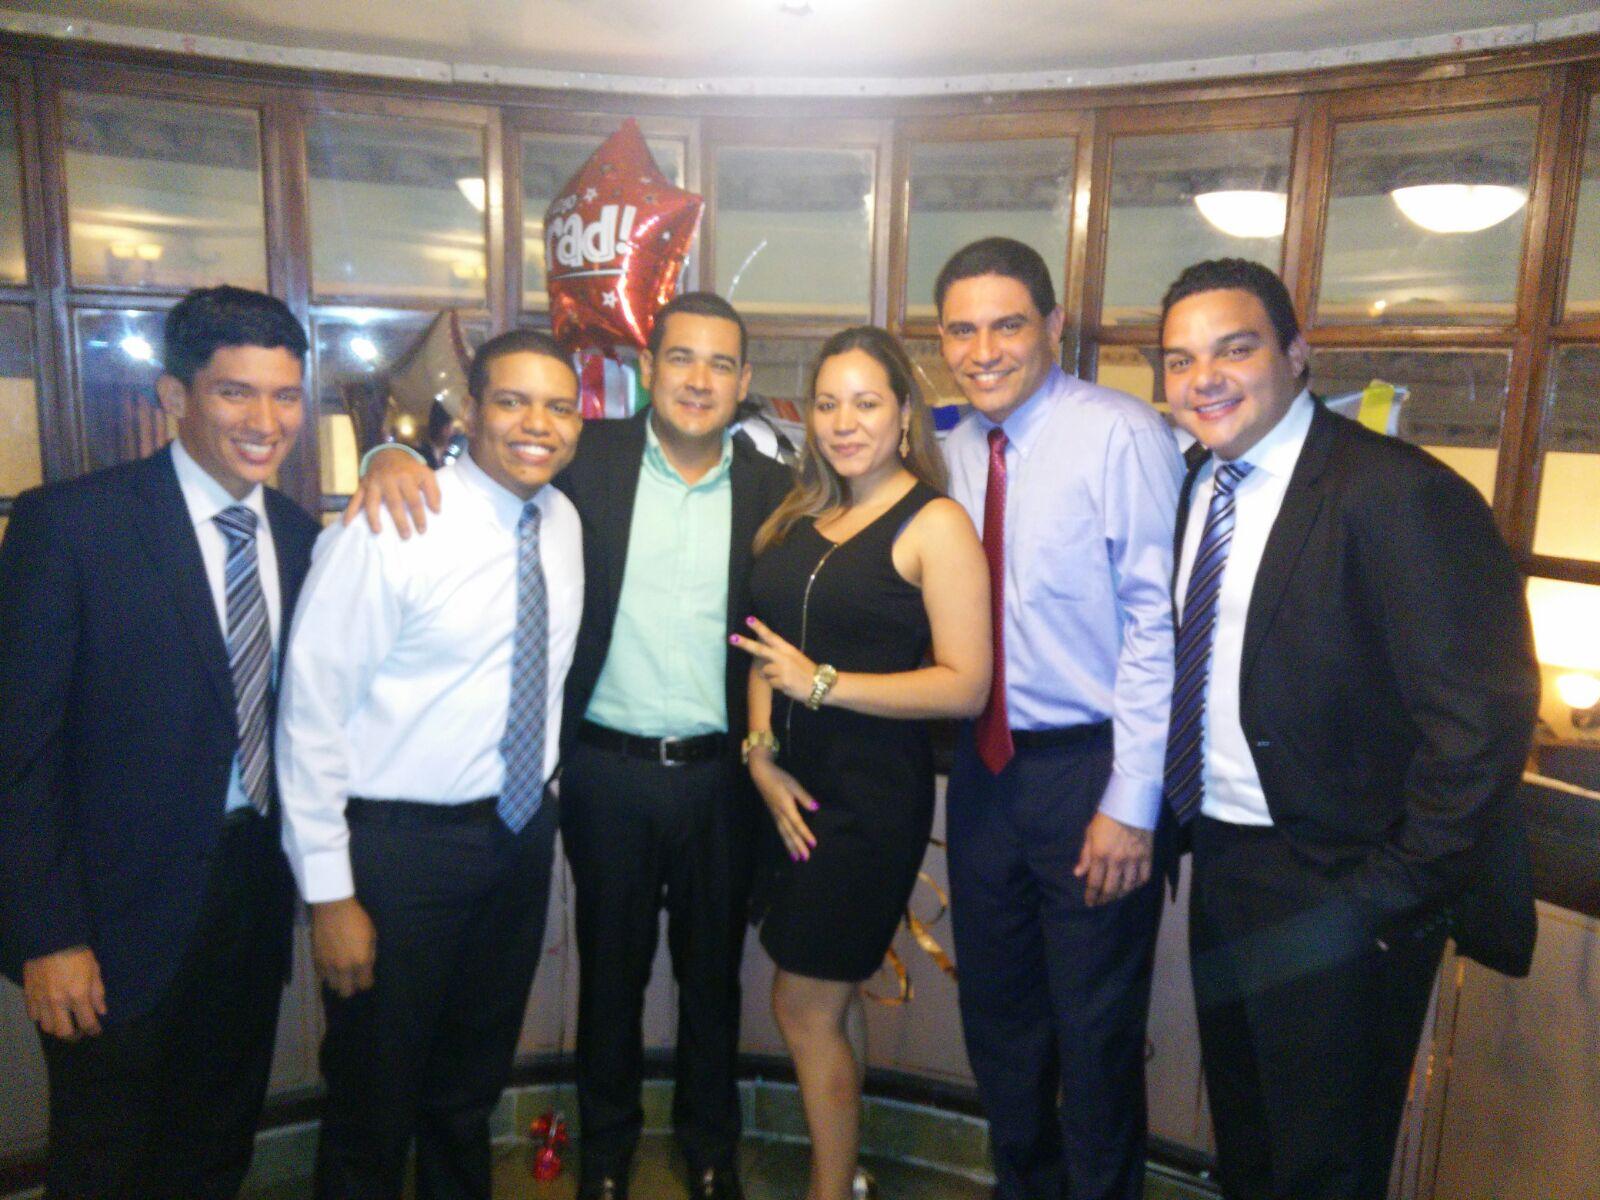 - Cursos de Ingles en Panama University of louisville